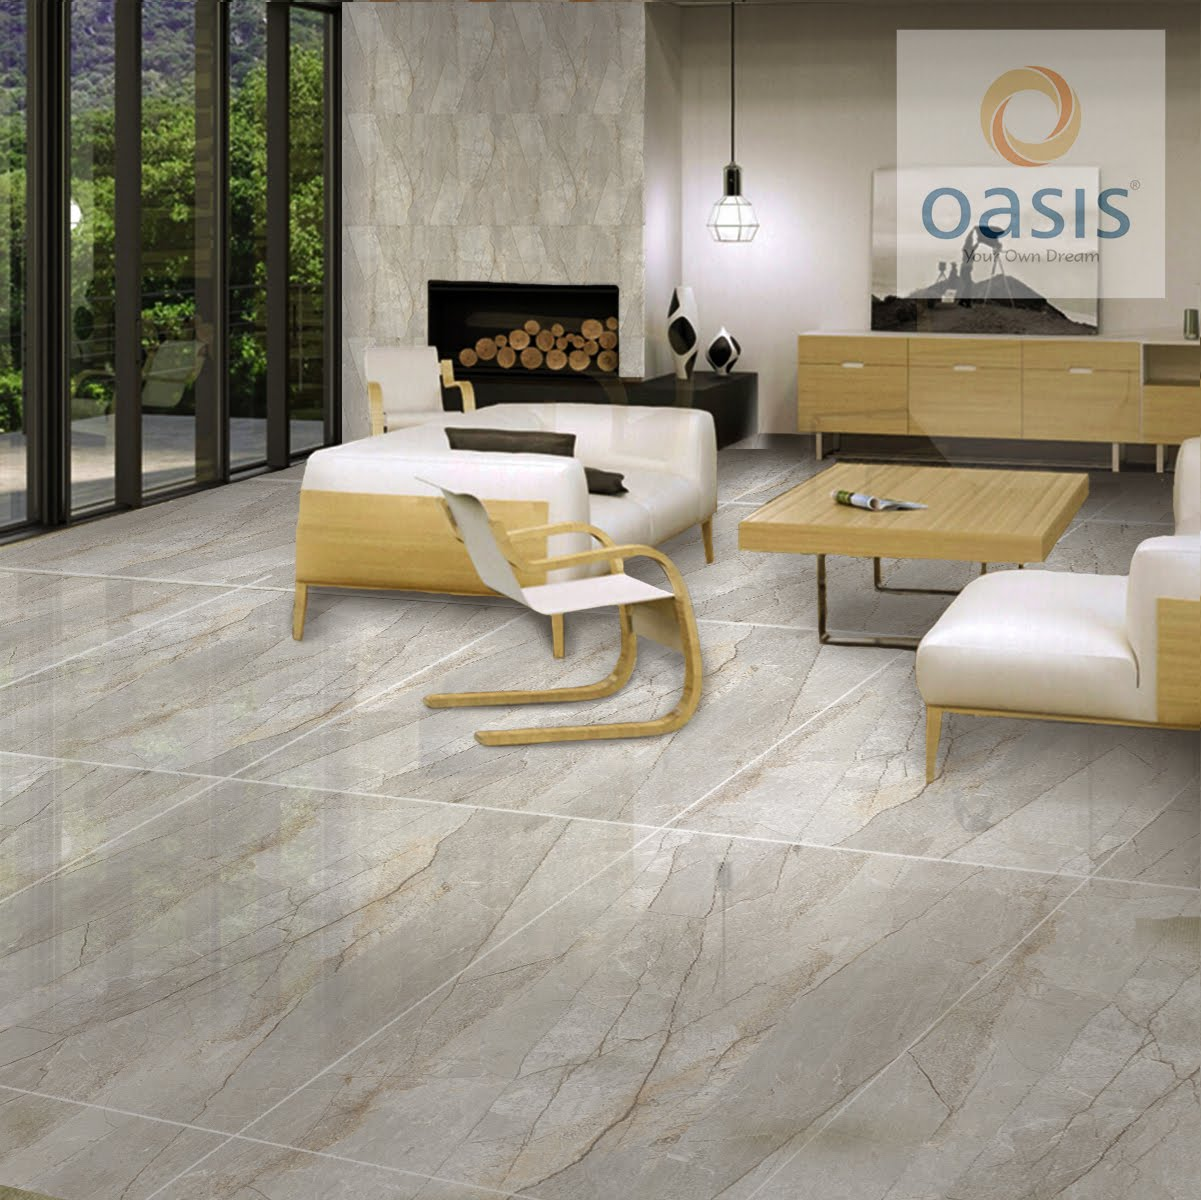 Design decor disha an indian design decor blog your home oasis tiles india dailygadgetfo Images